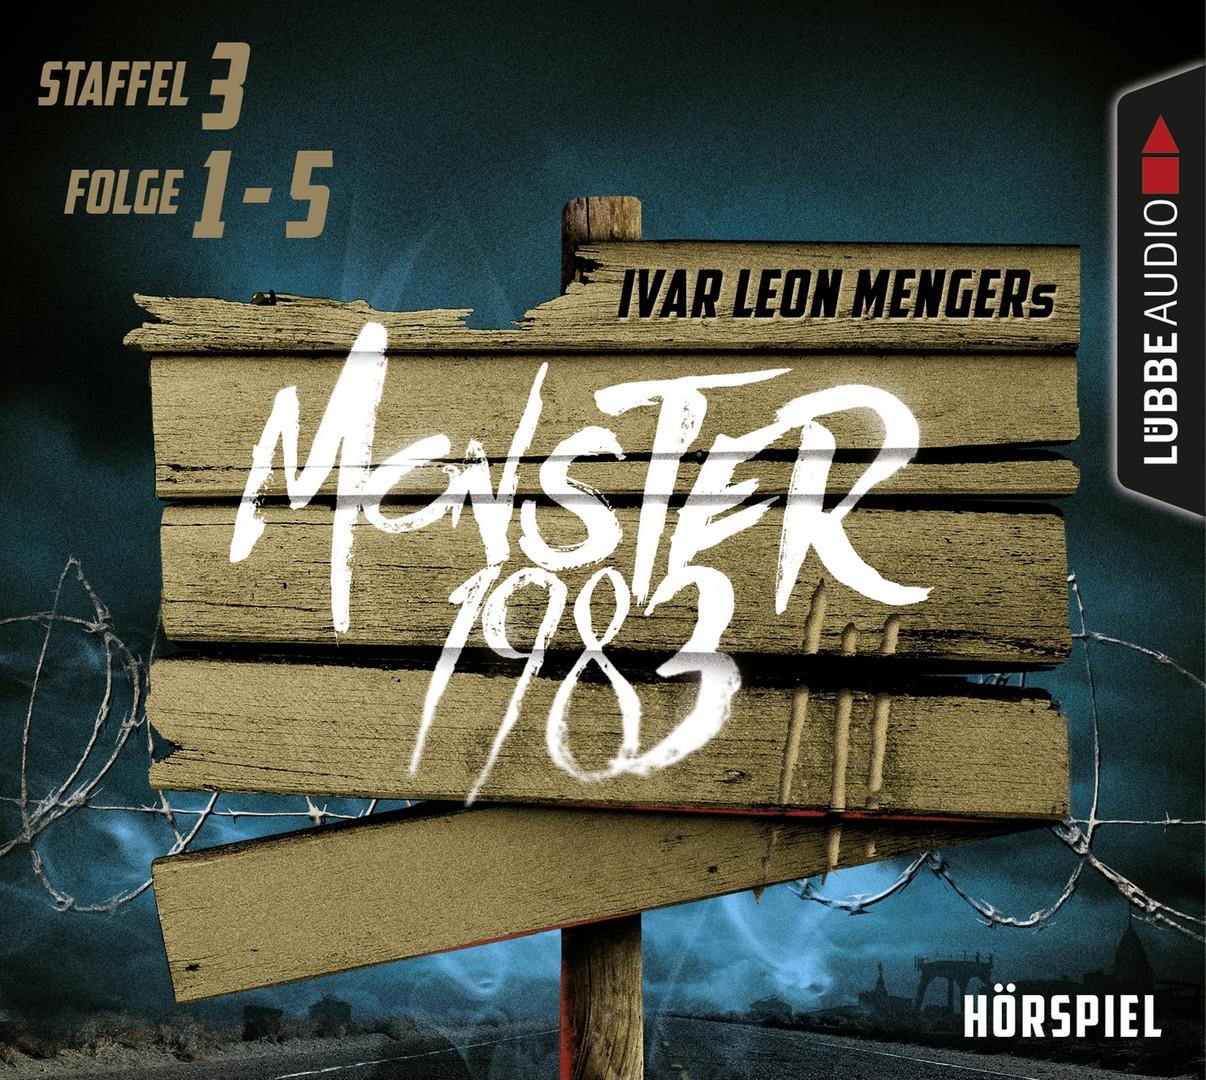 Monster 1983 - Staffel III, Folge 01-05